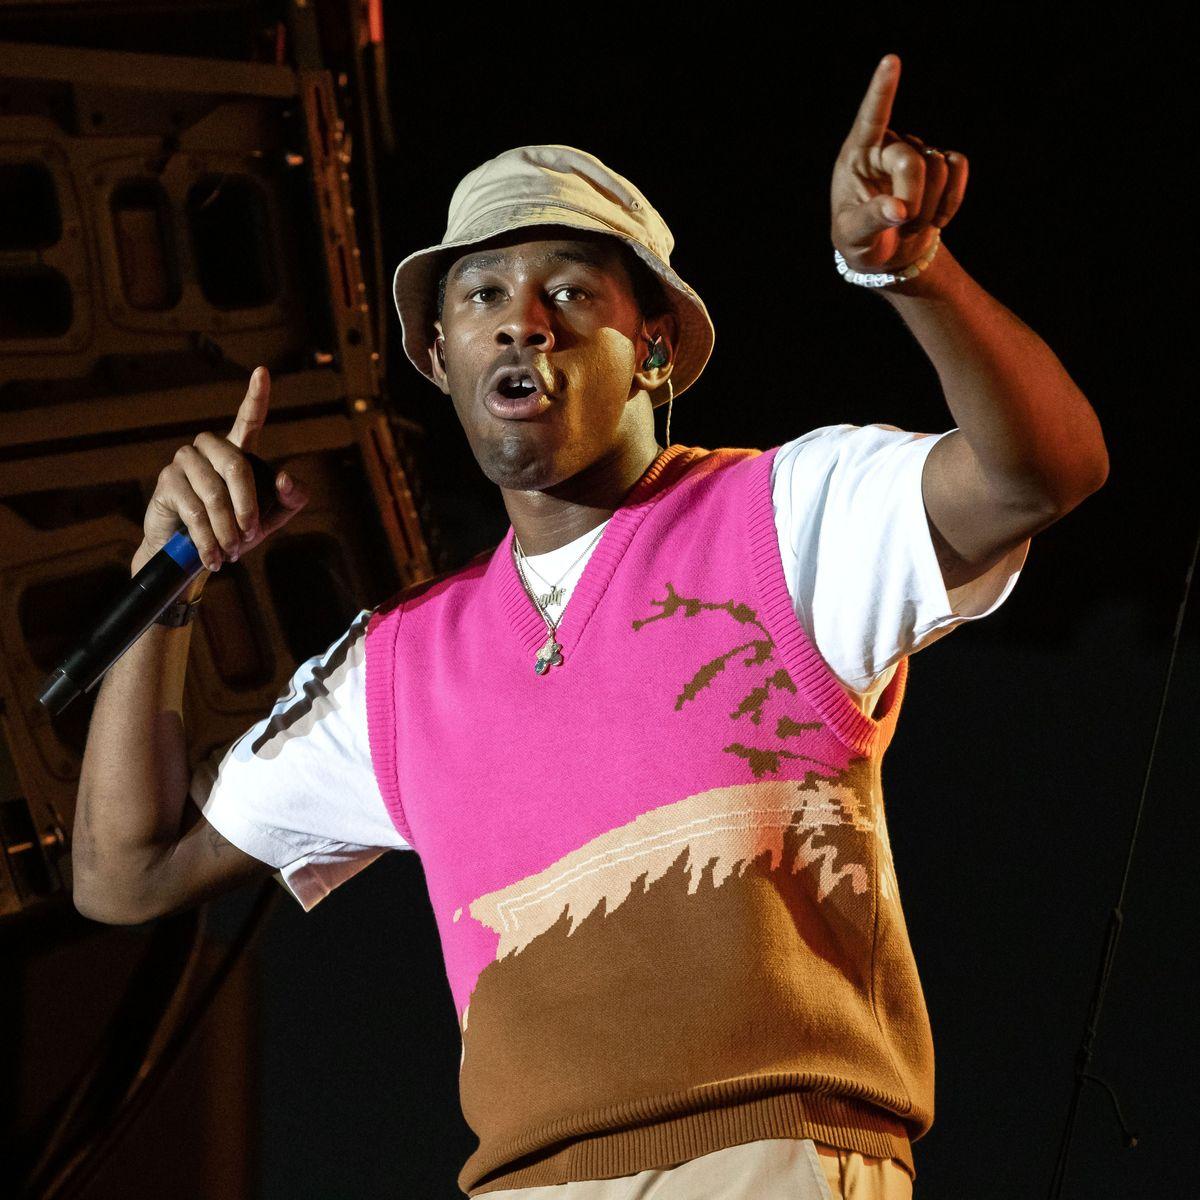 Tyler, the Creator 'IGOR' Album Review